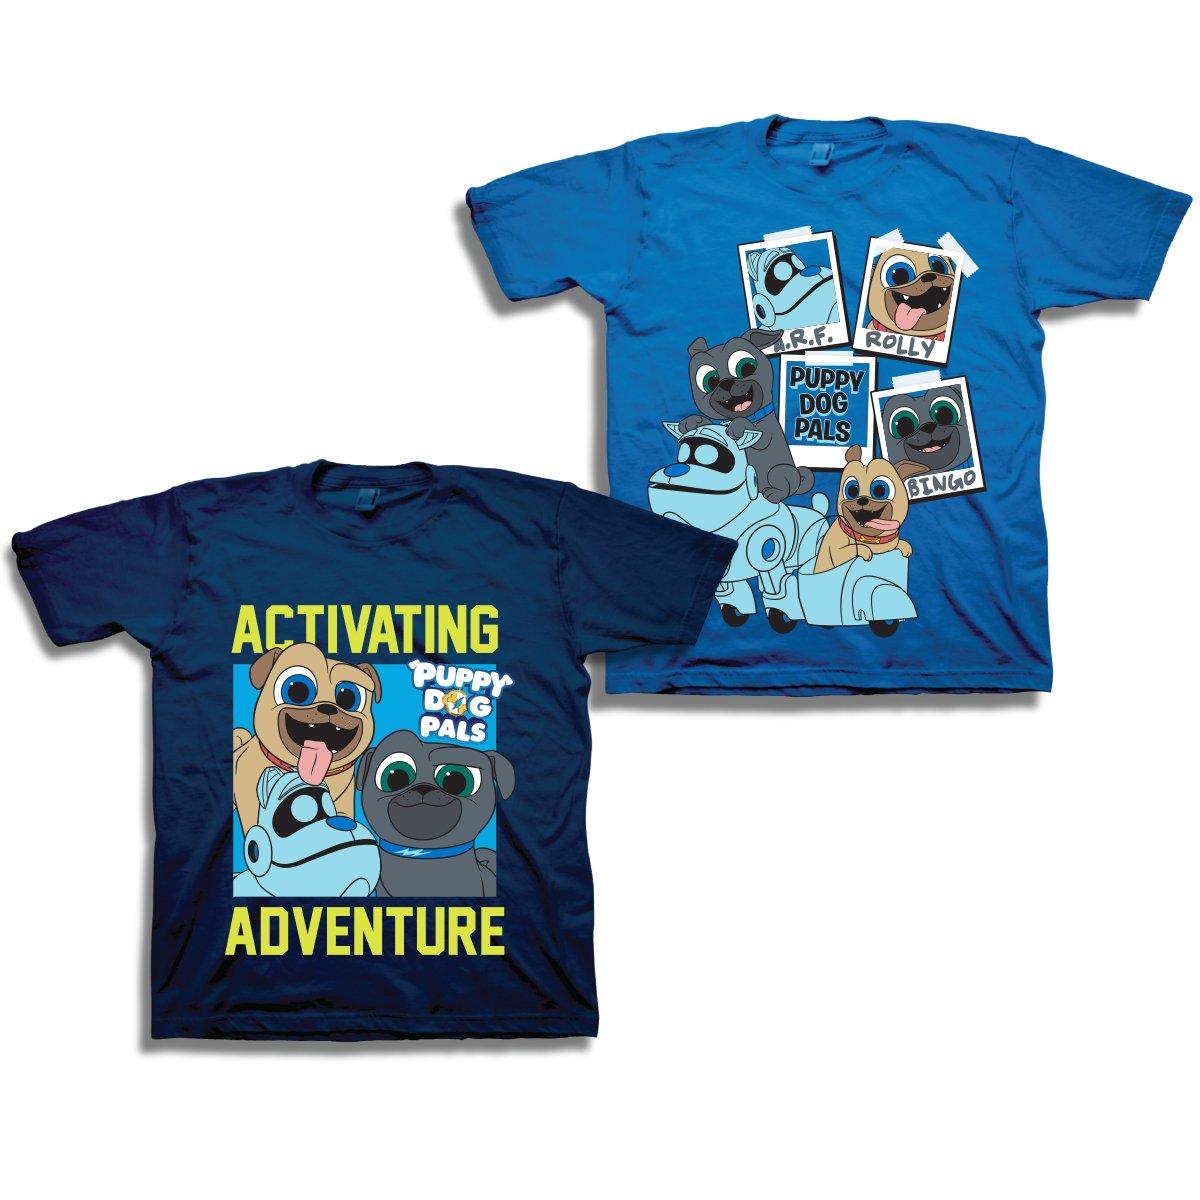 Navy Royal 3T Navy Royal 3T Disney Puppy Dog Pals Shirt 2 Pack of Puppy Dog Pals Tees Featuring Bingo, Rolly, Bob, Hissy and A.R.F